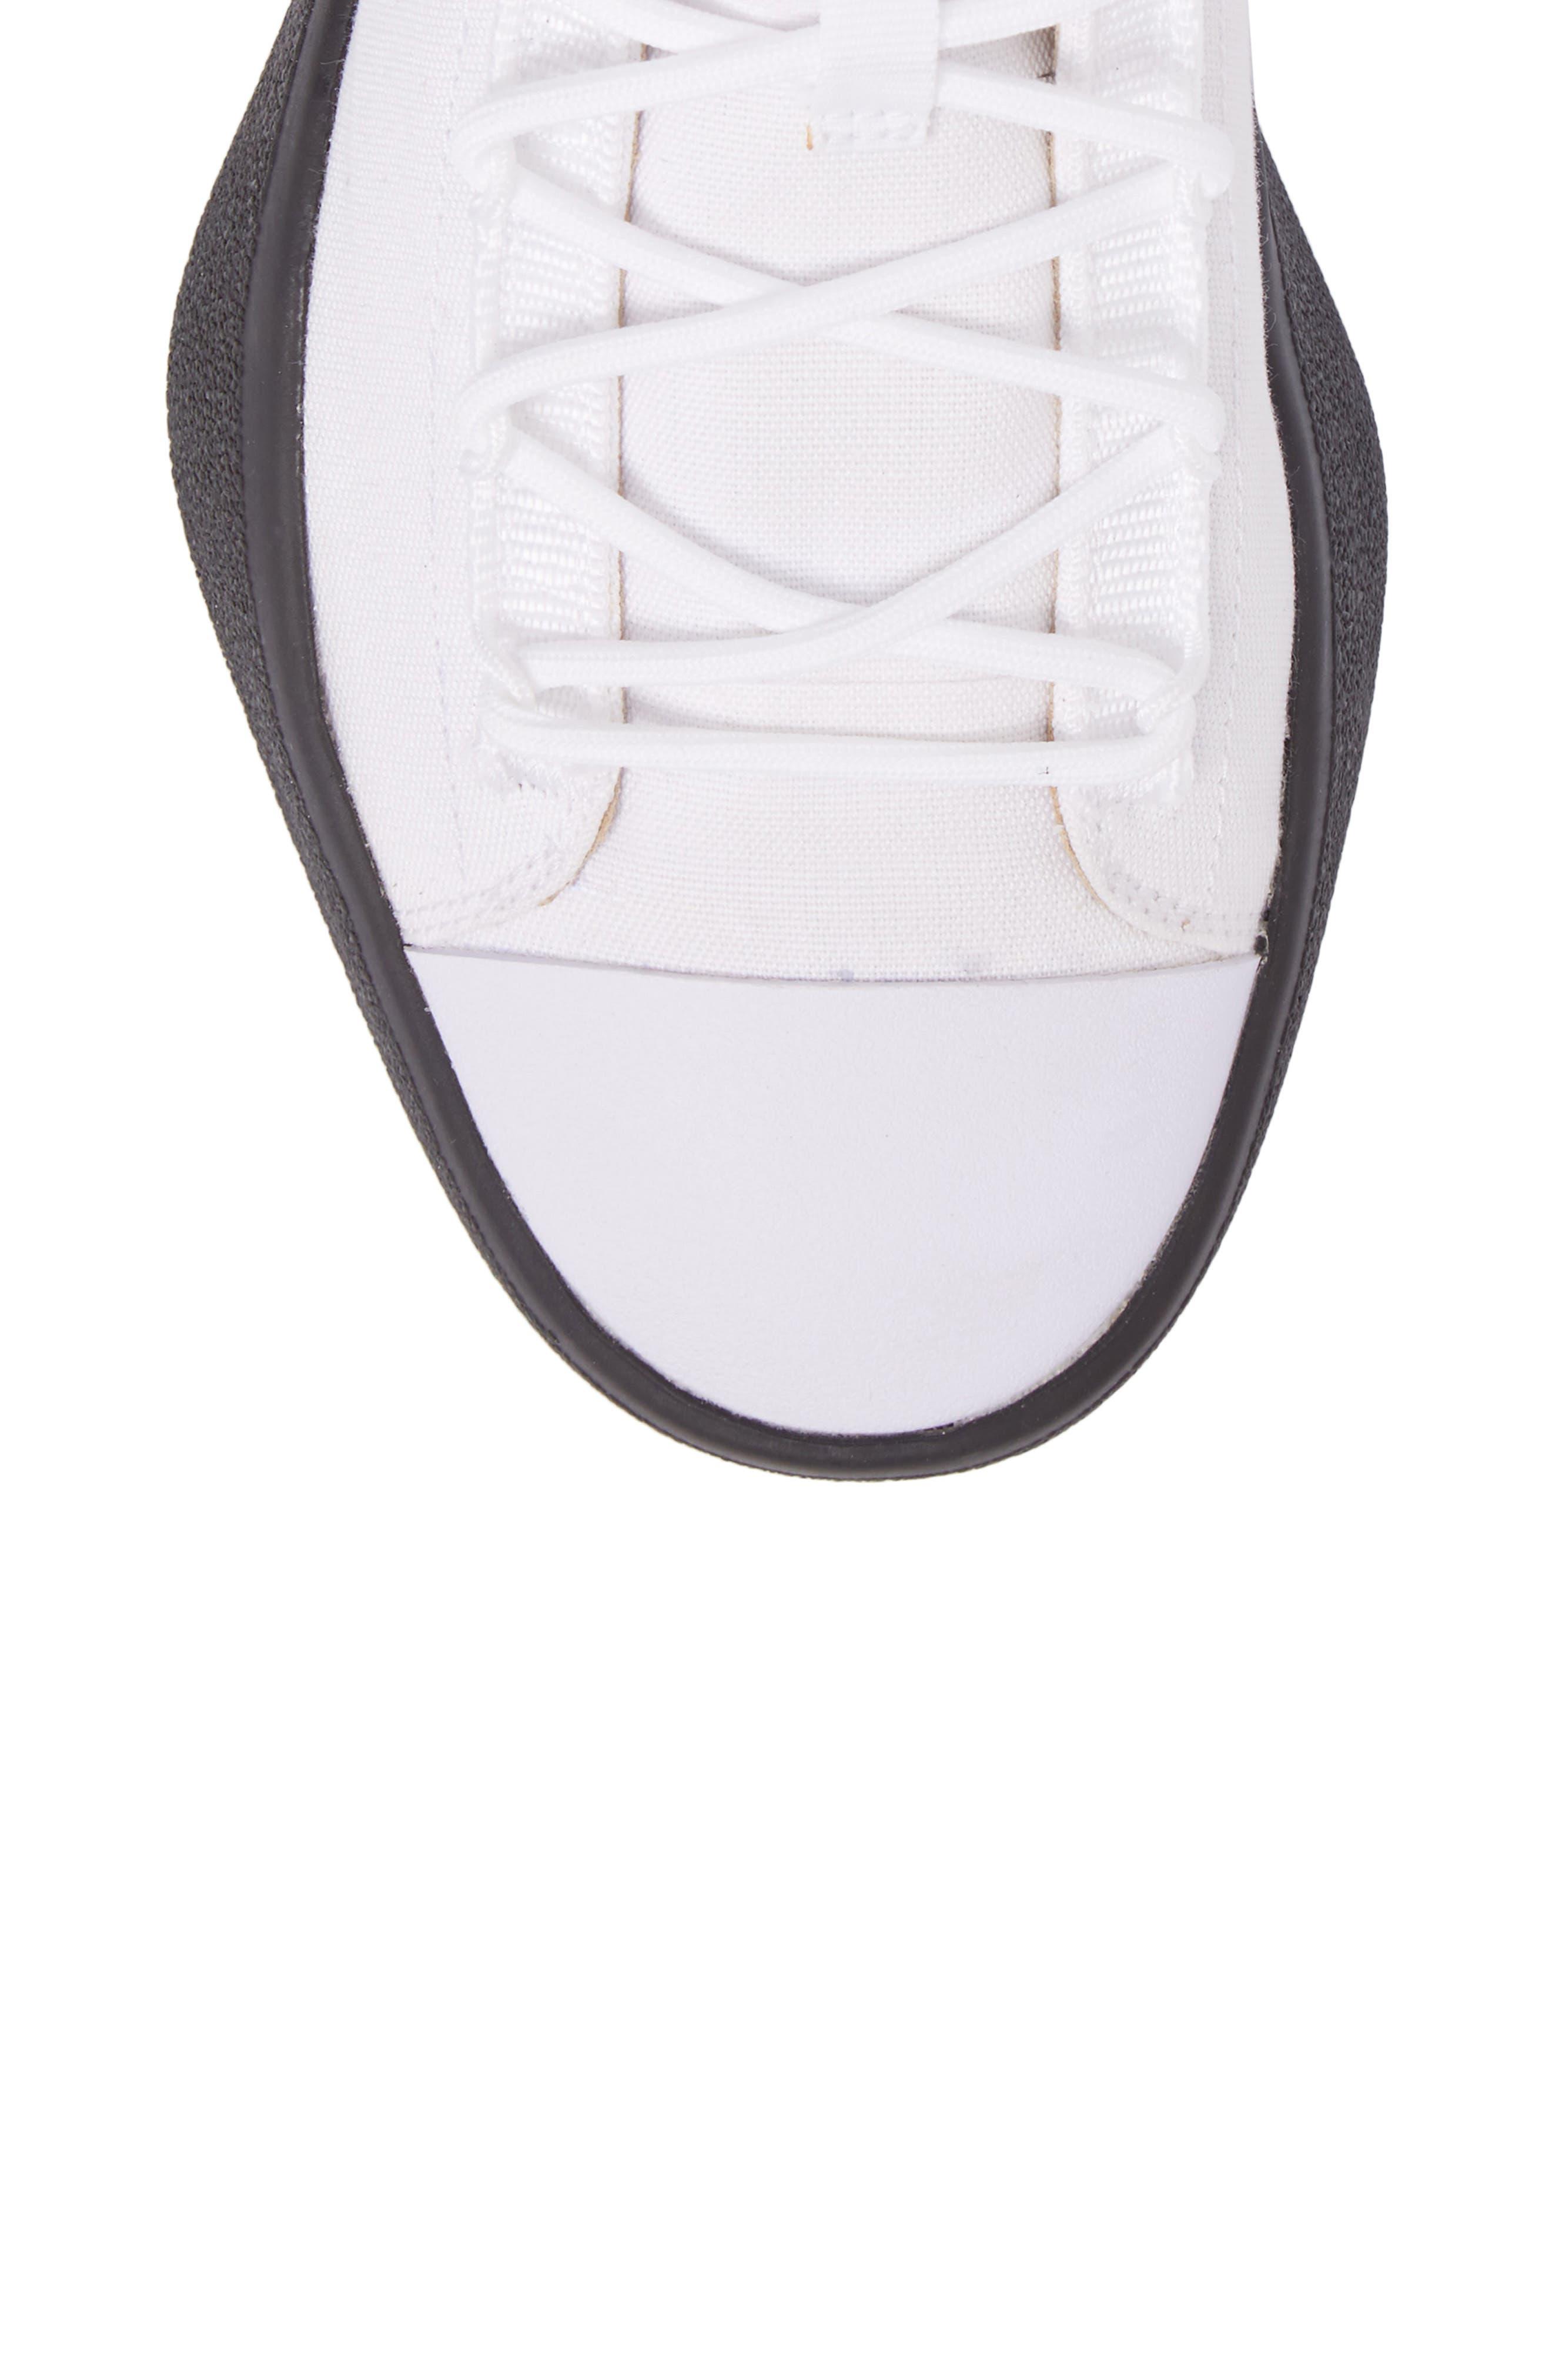 Bashyo High Top Sneaker,                             Alternate thumbnail 5, color,                             100